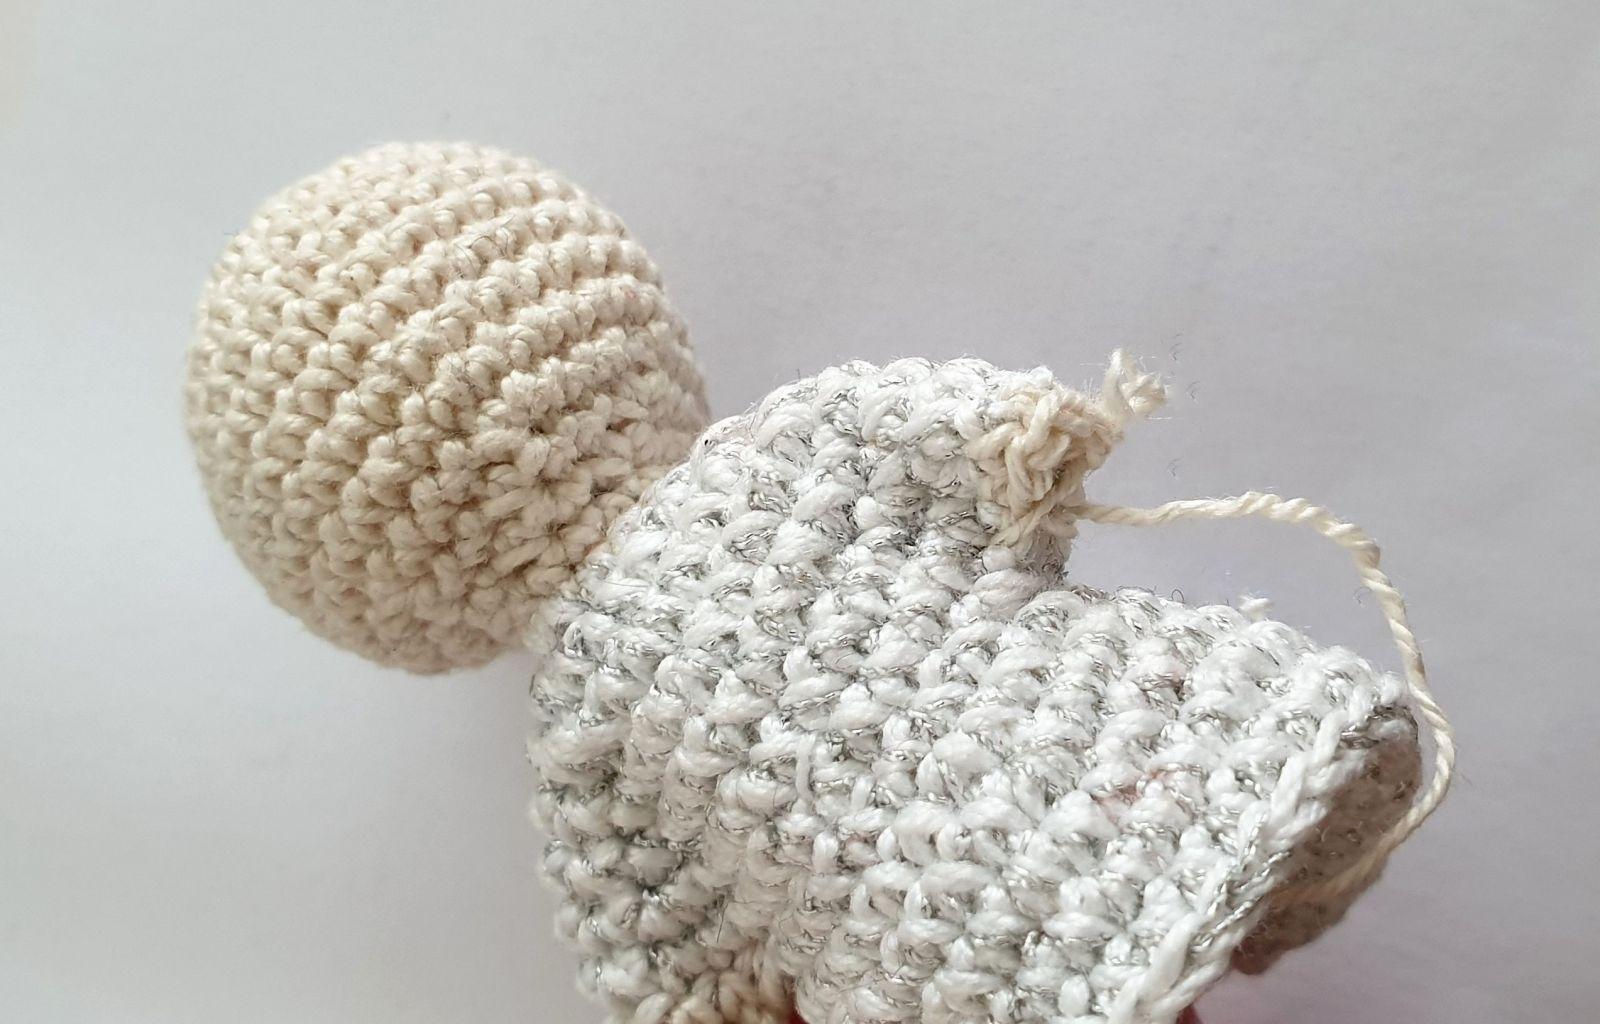 Kostenlose Hakelanleitung Schutzengel Hello I Came Up With A Beautiful Knitting Model To Assess Your Sh In 2020 Hakelanleitung Hakeln Anleitung Kostenlos Hakeln